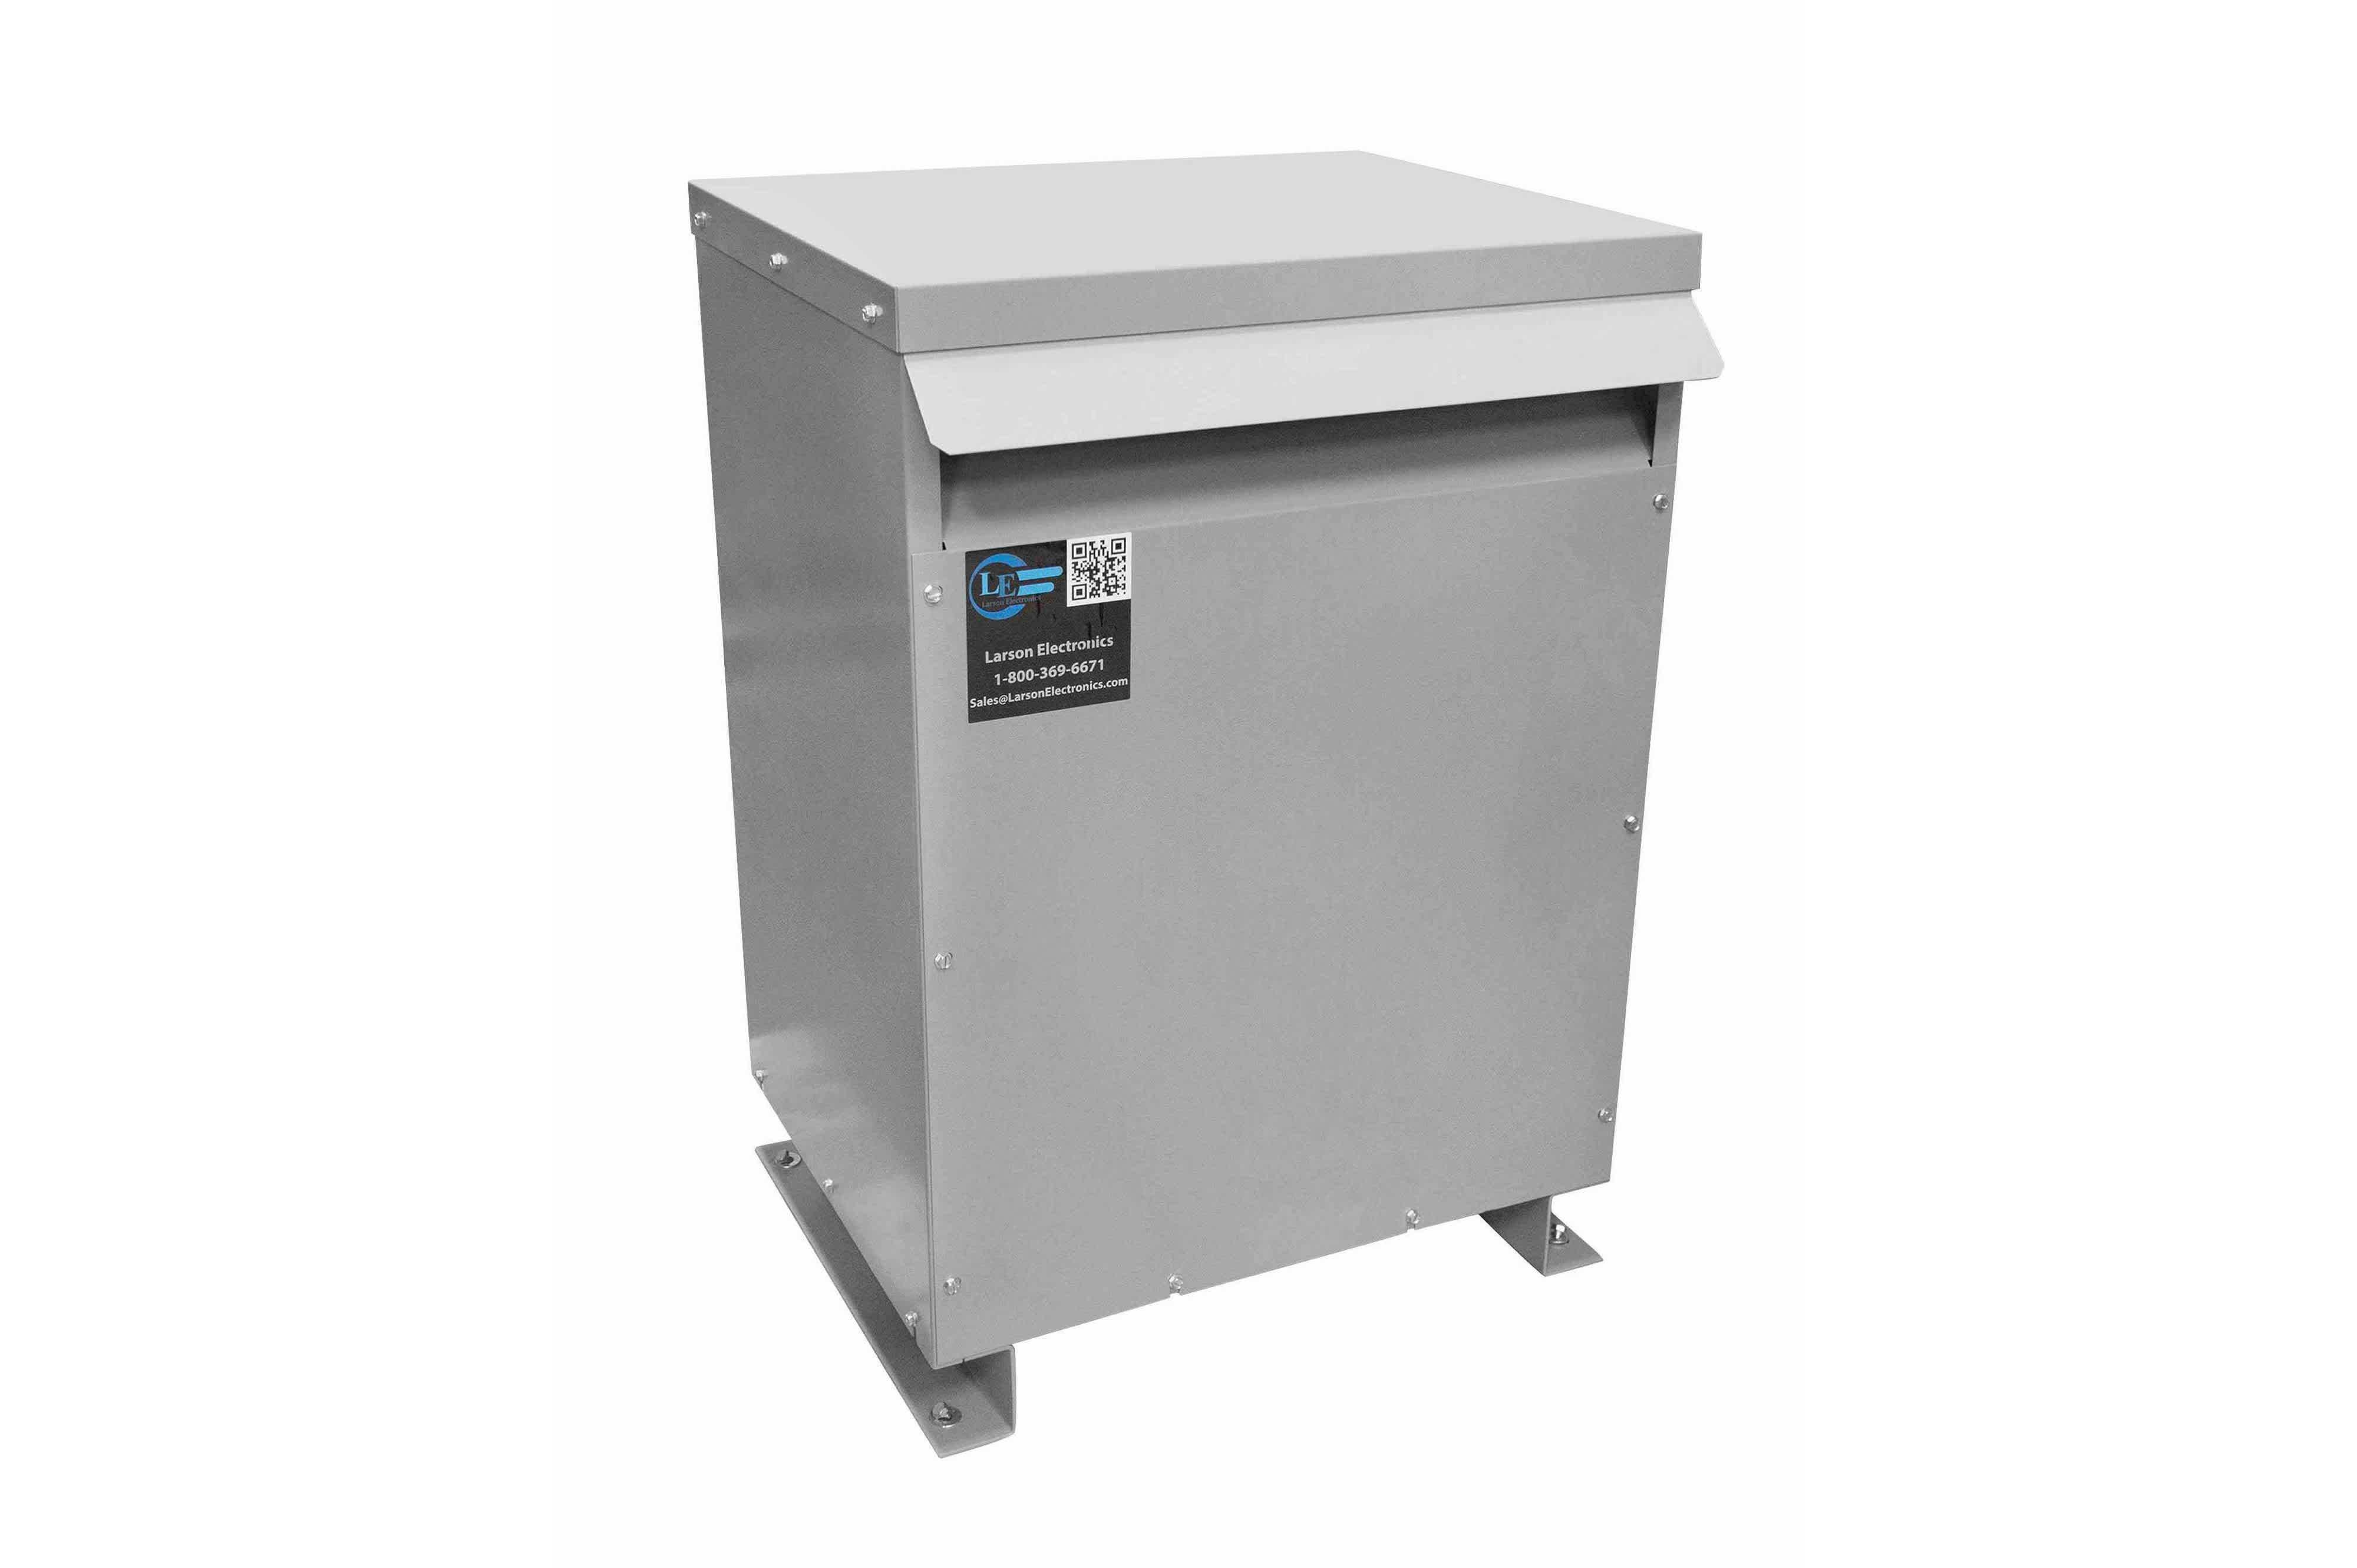 100 kVA 3PH DOE Transformer, 575V Delta Primary, 208Y/120 Wye-N Secondary, N3R, Ventilated, 60 Hz